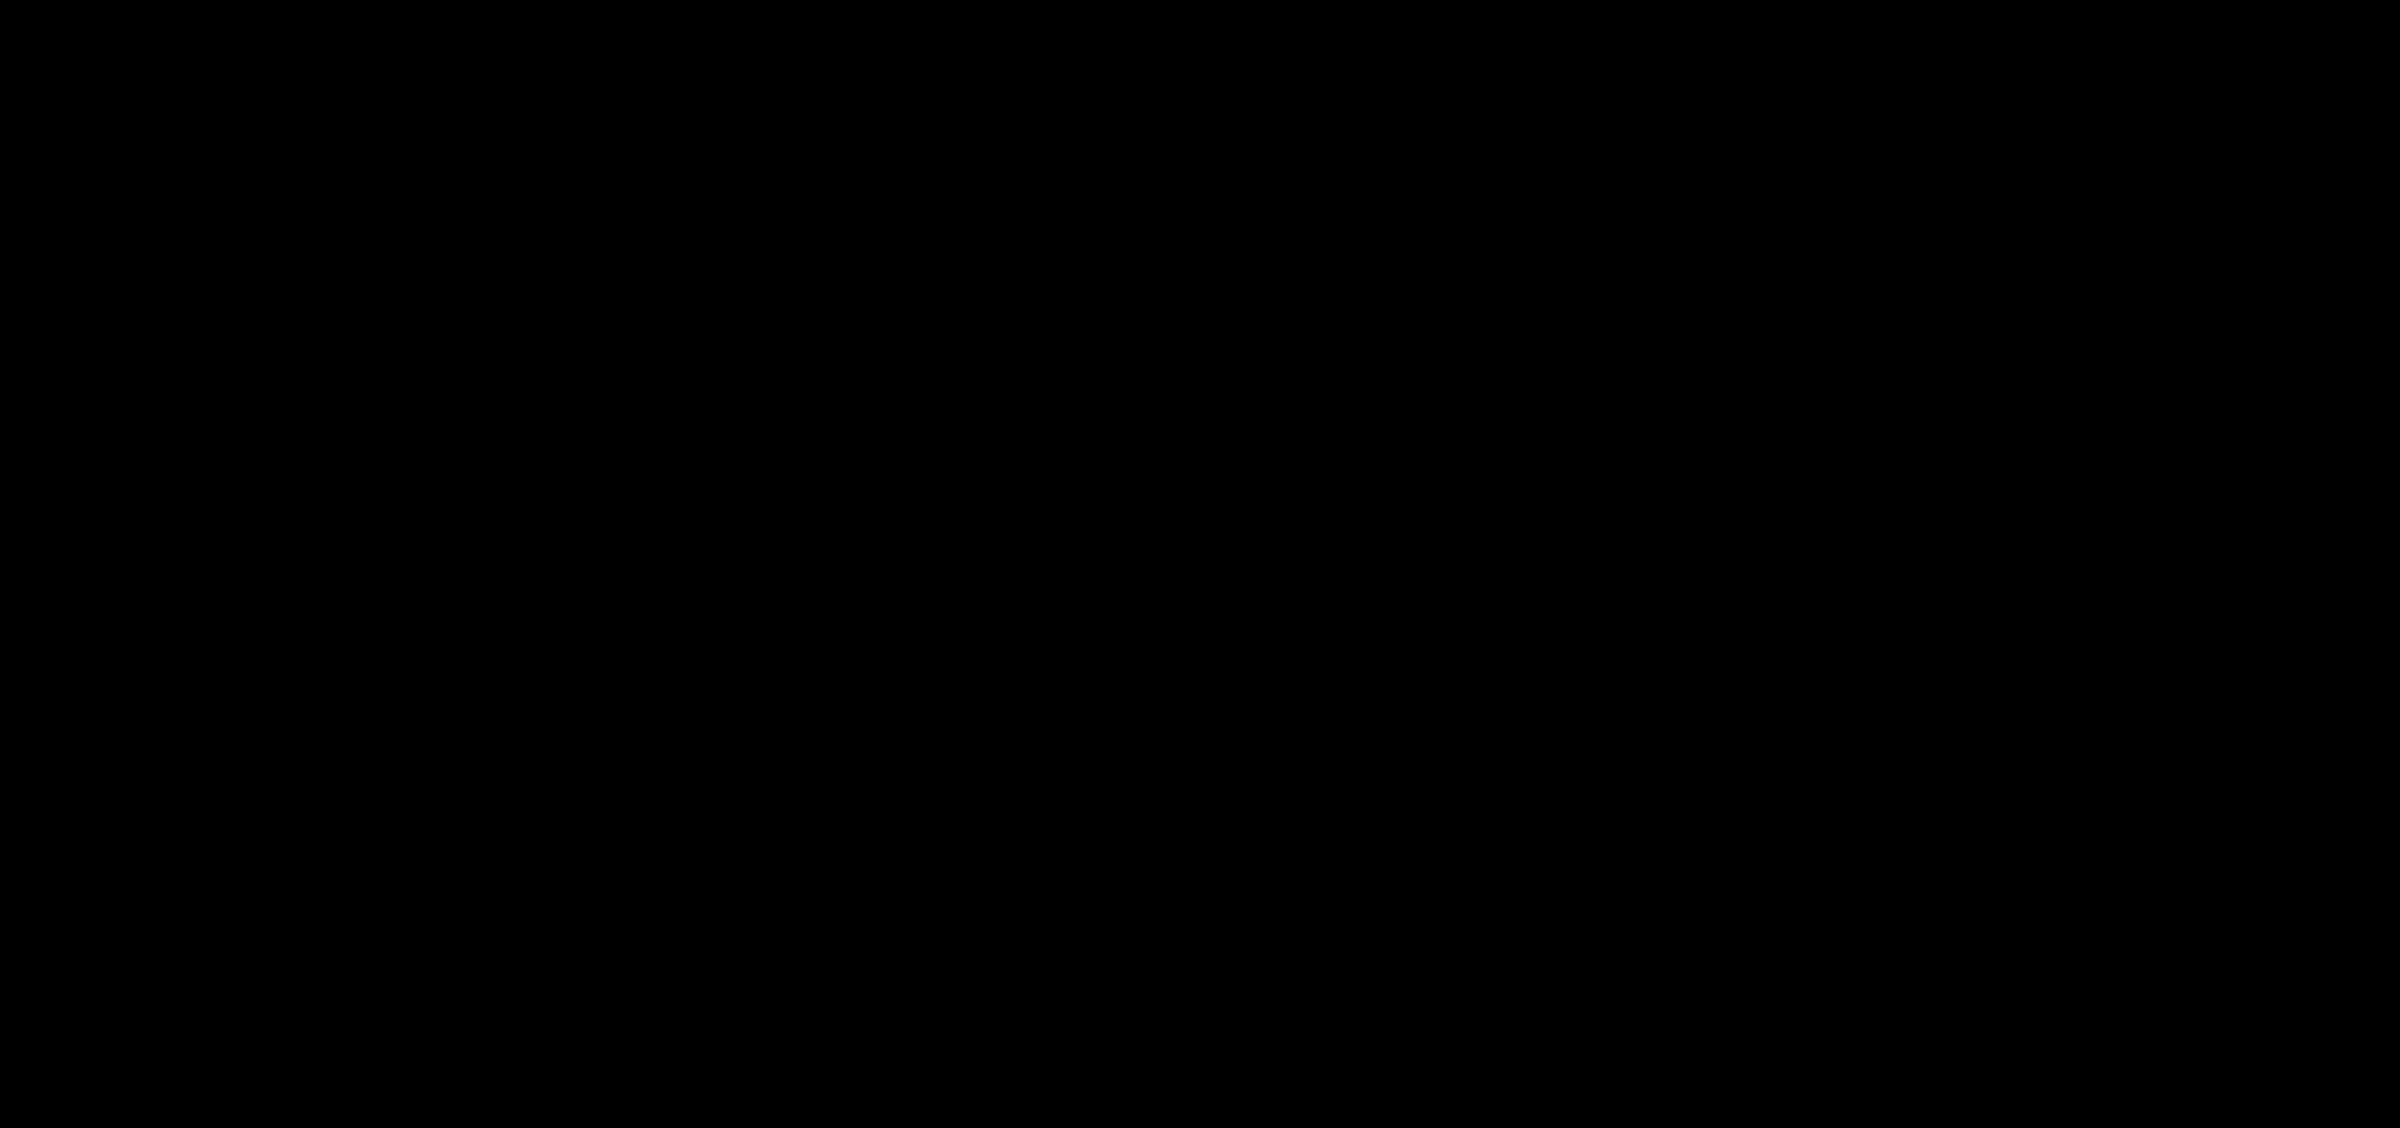 2400x1128 Clipart